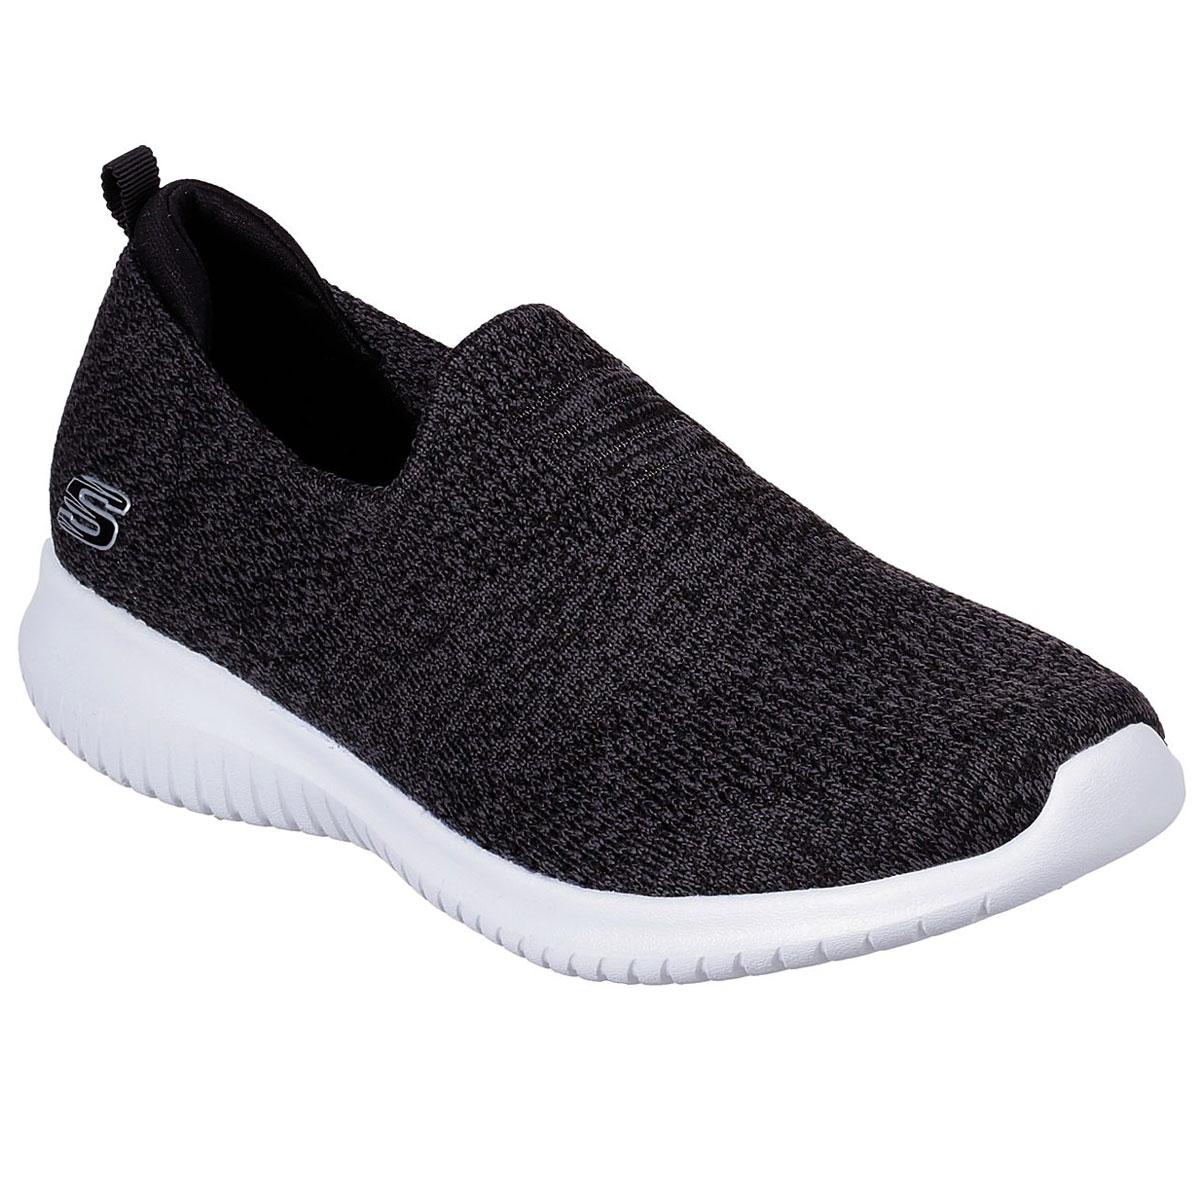 Skechers Women's Ultra Flex Harmonious Shoes - Black, 9.5